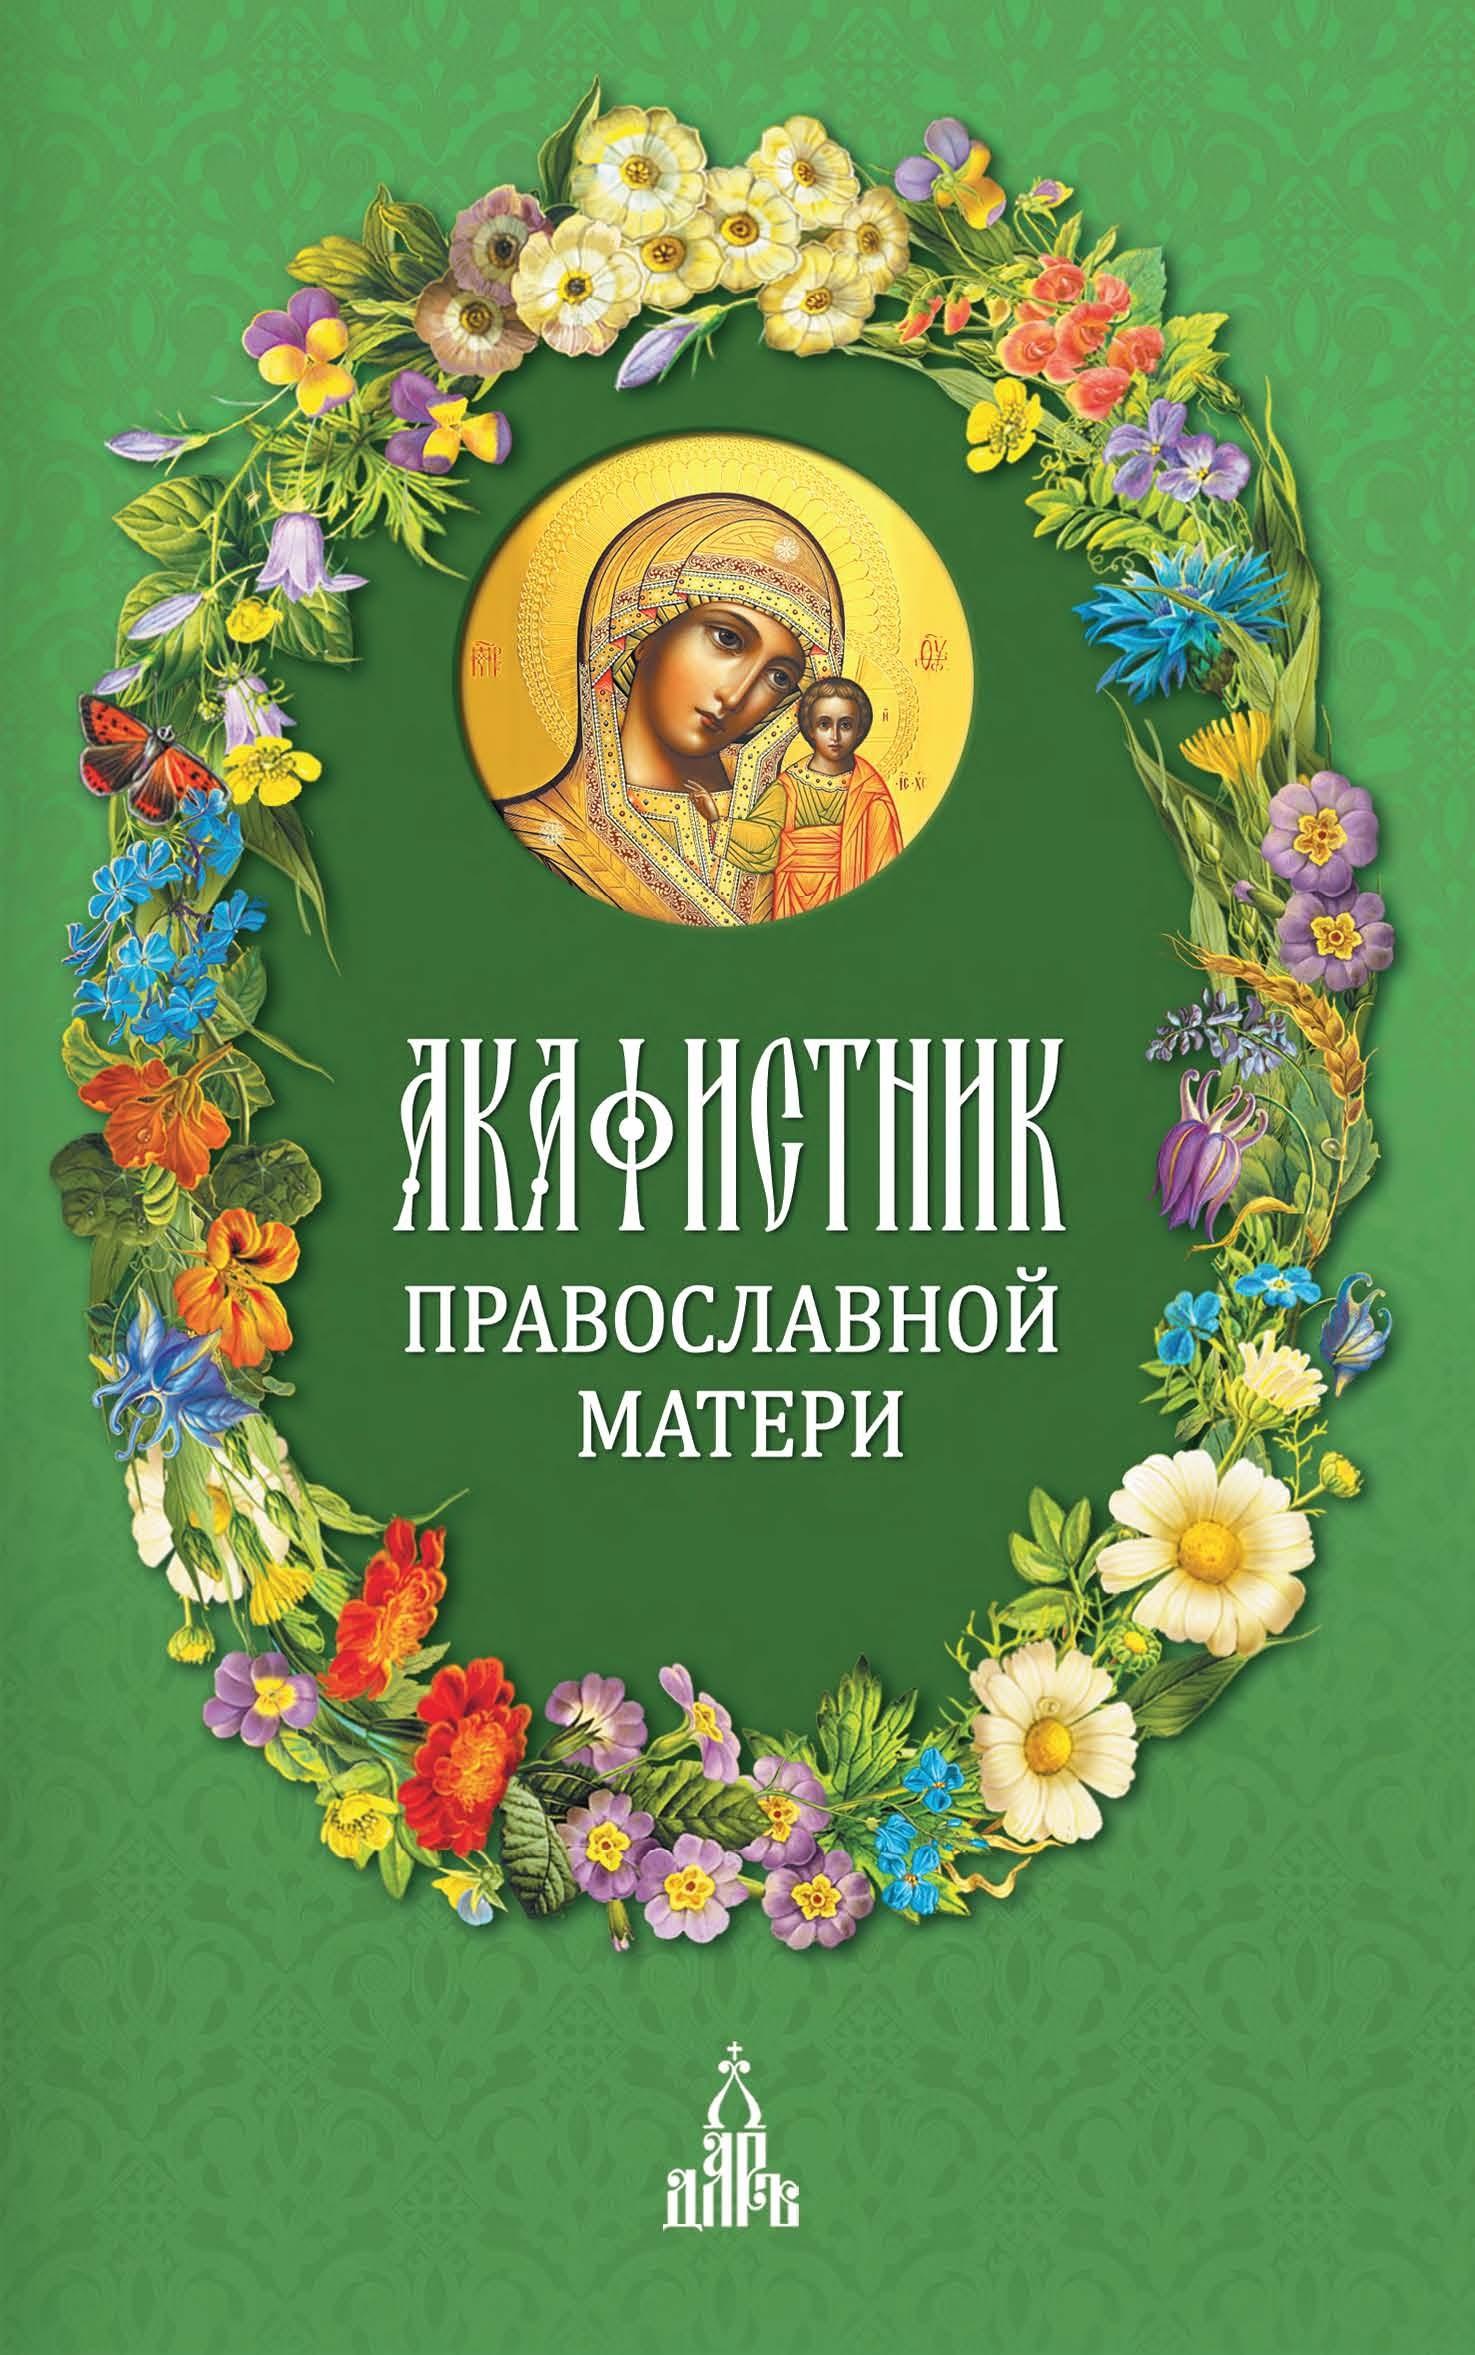 akafistnik pravoslavnoy materi